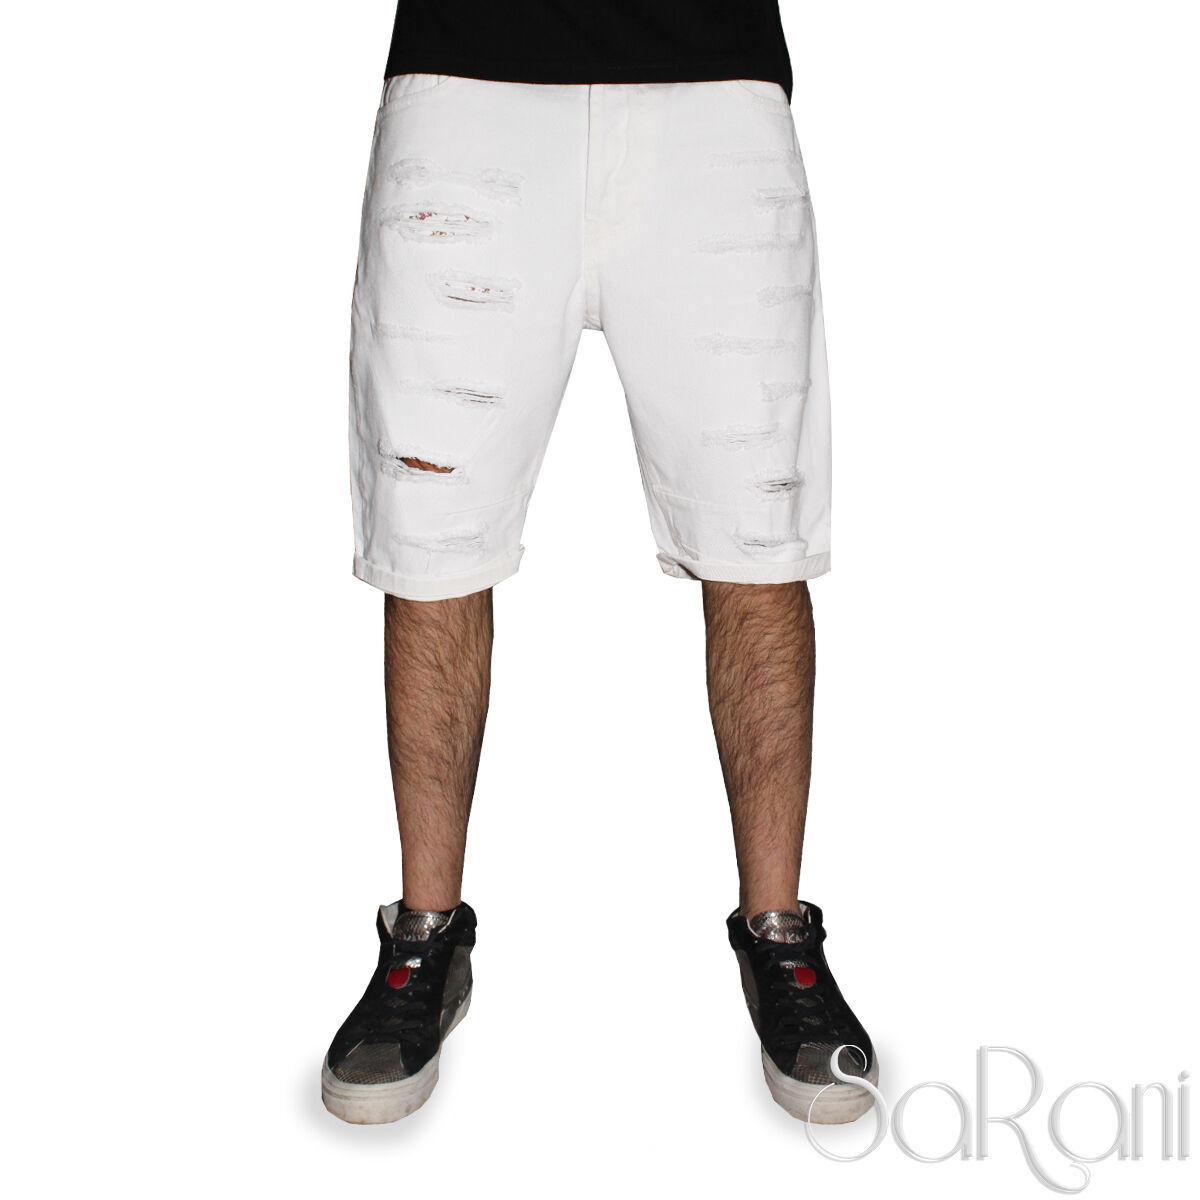 Bermuda Mann Akiro ' Kurze Hosen Casual Zerissen Denim Weiße Baumwolle Sarani